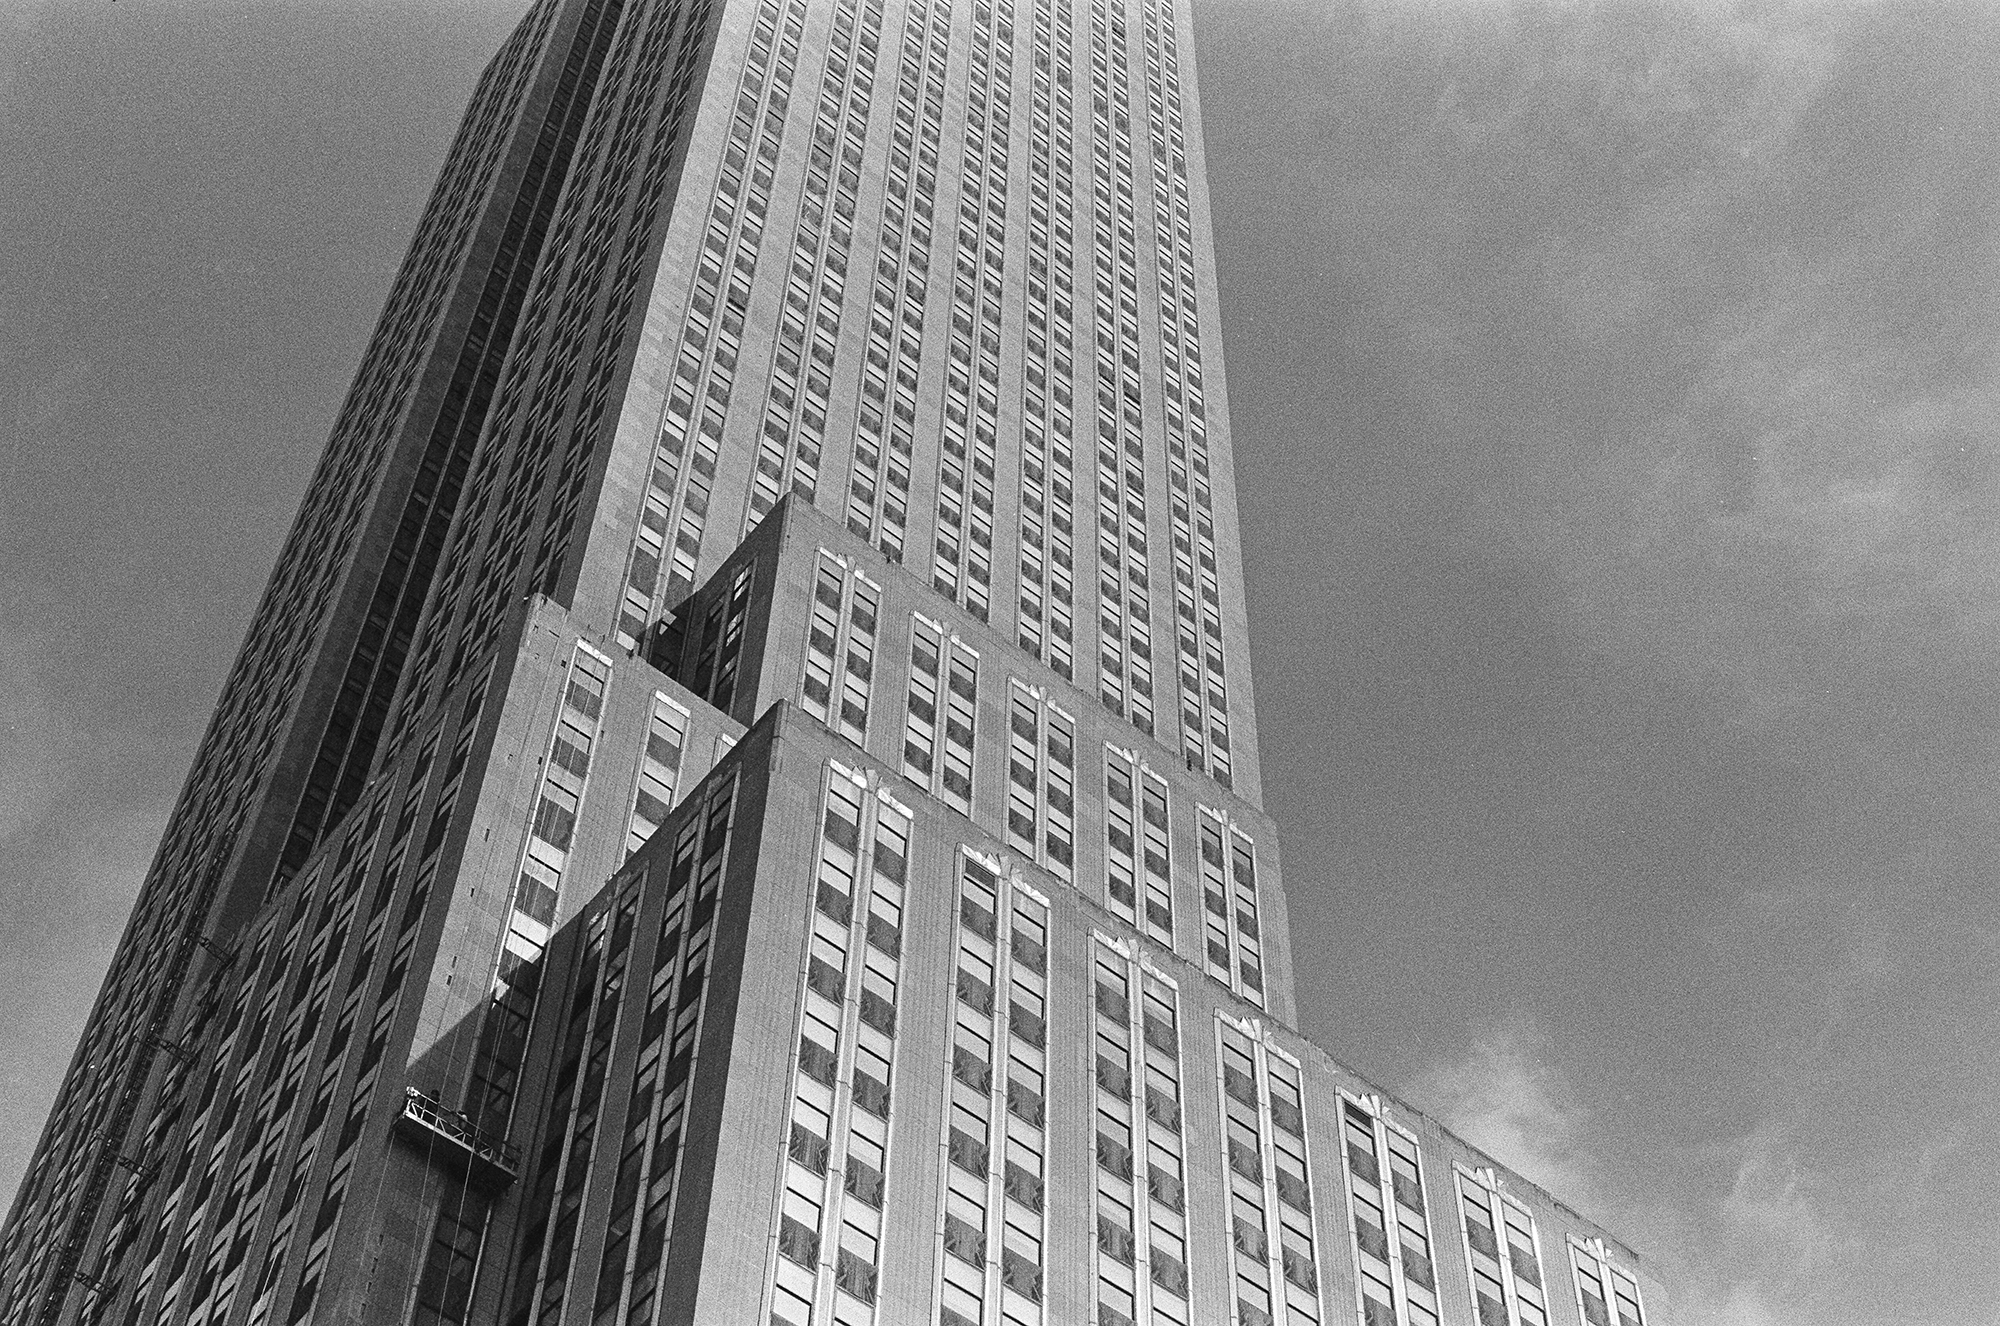 the empire state building / Manhattan